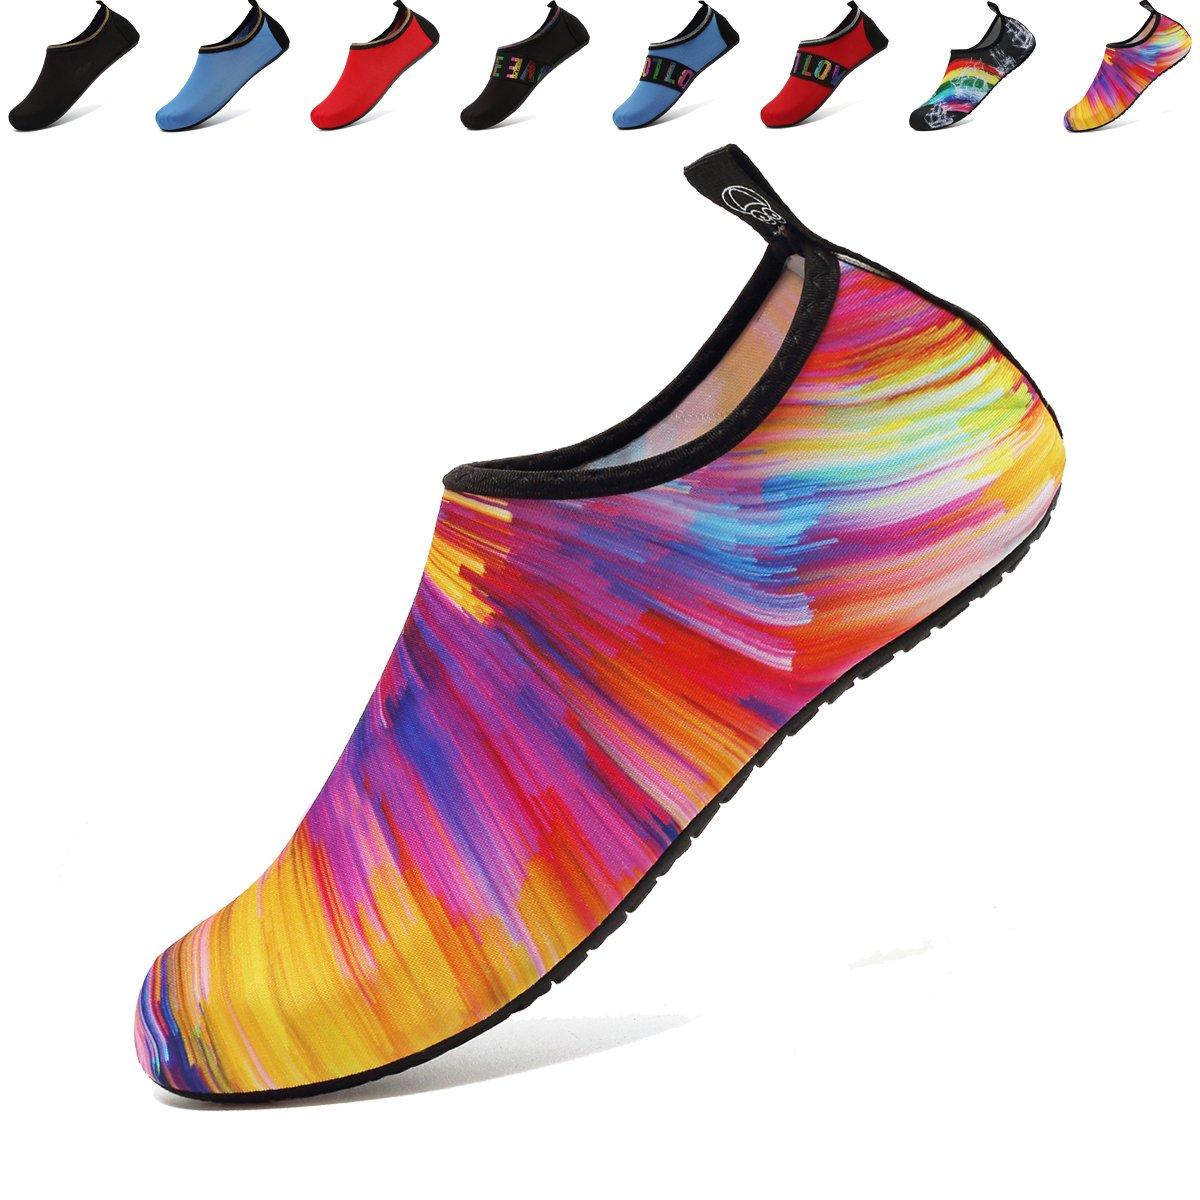 ANLUKE Womens Mens Water Barefoot Shoes for Summer Swim Aqua Yoga Socks Beach Orange/Colorful 40/41